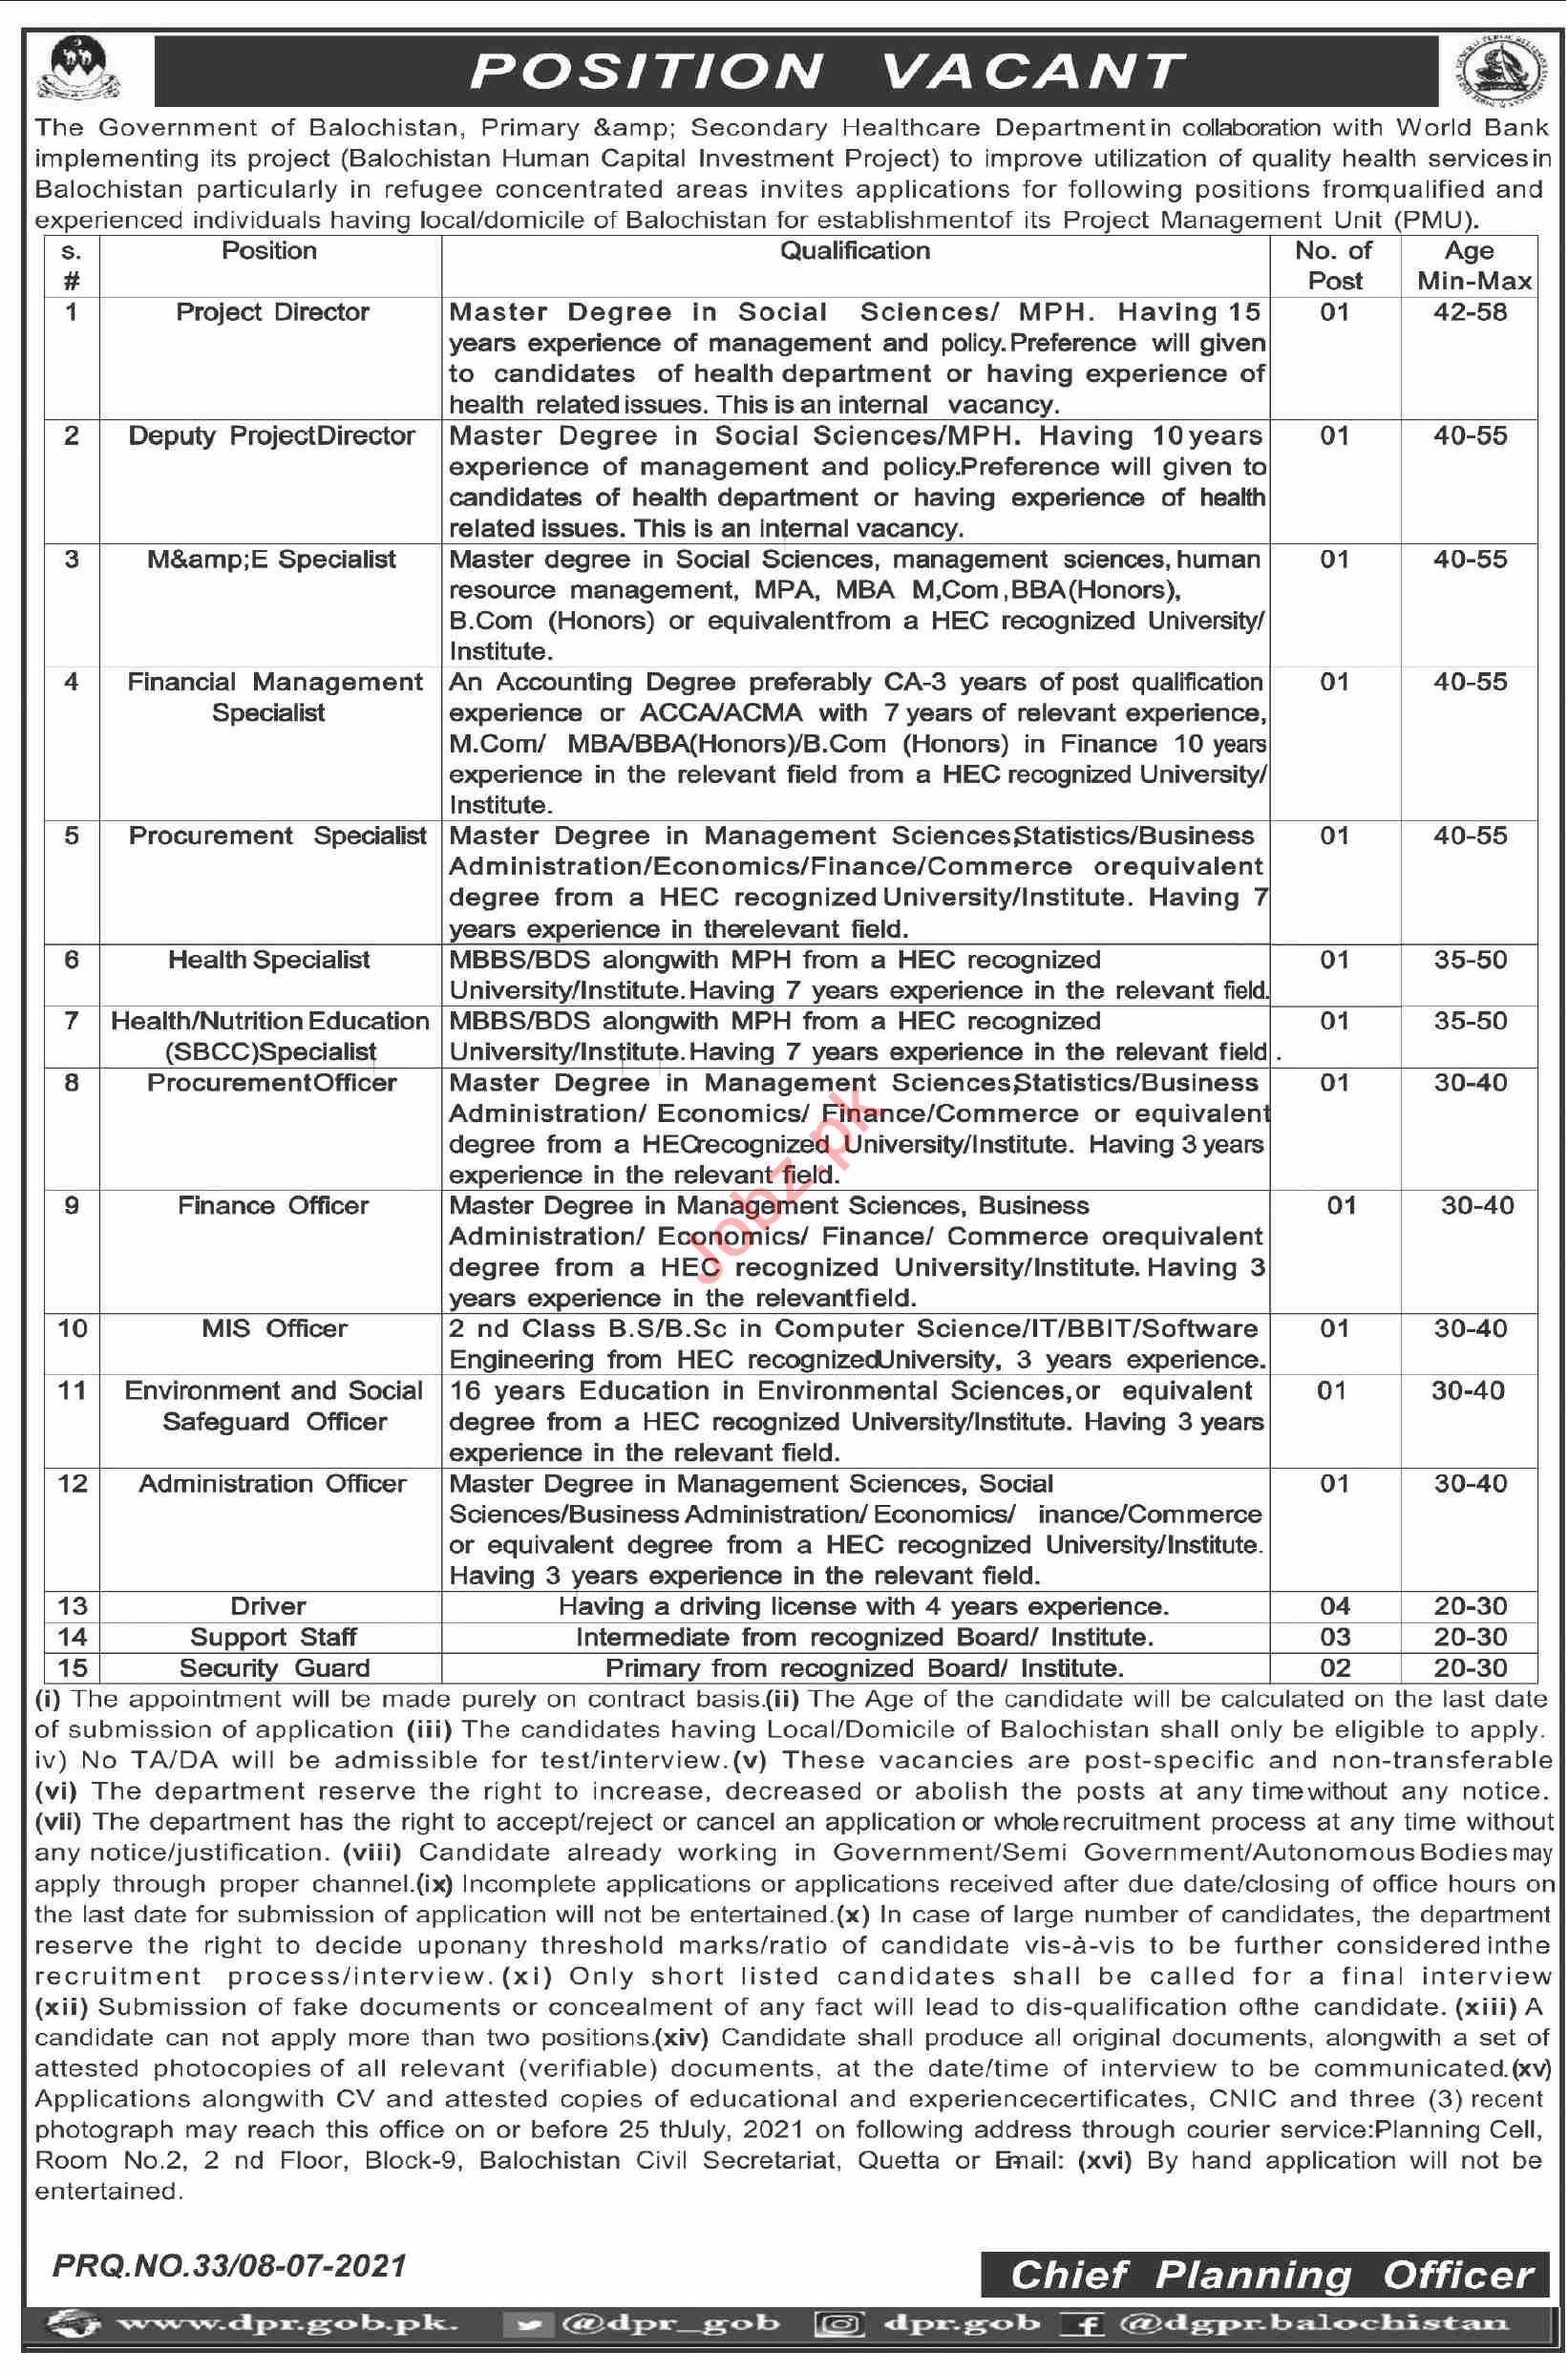 Balochistan Human Capital Investment Project Jobs 2021